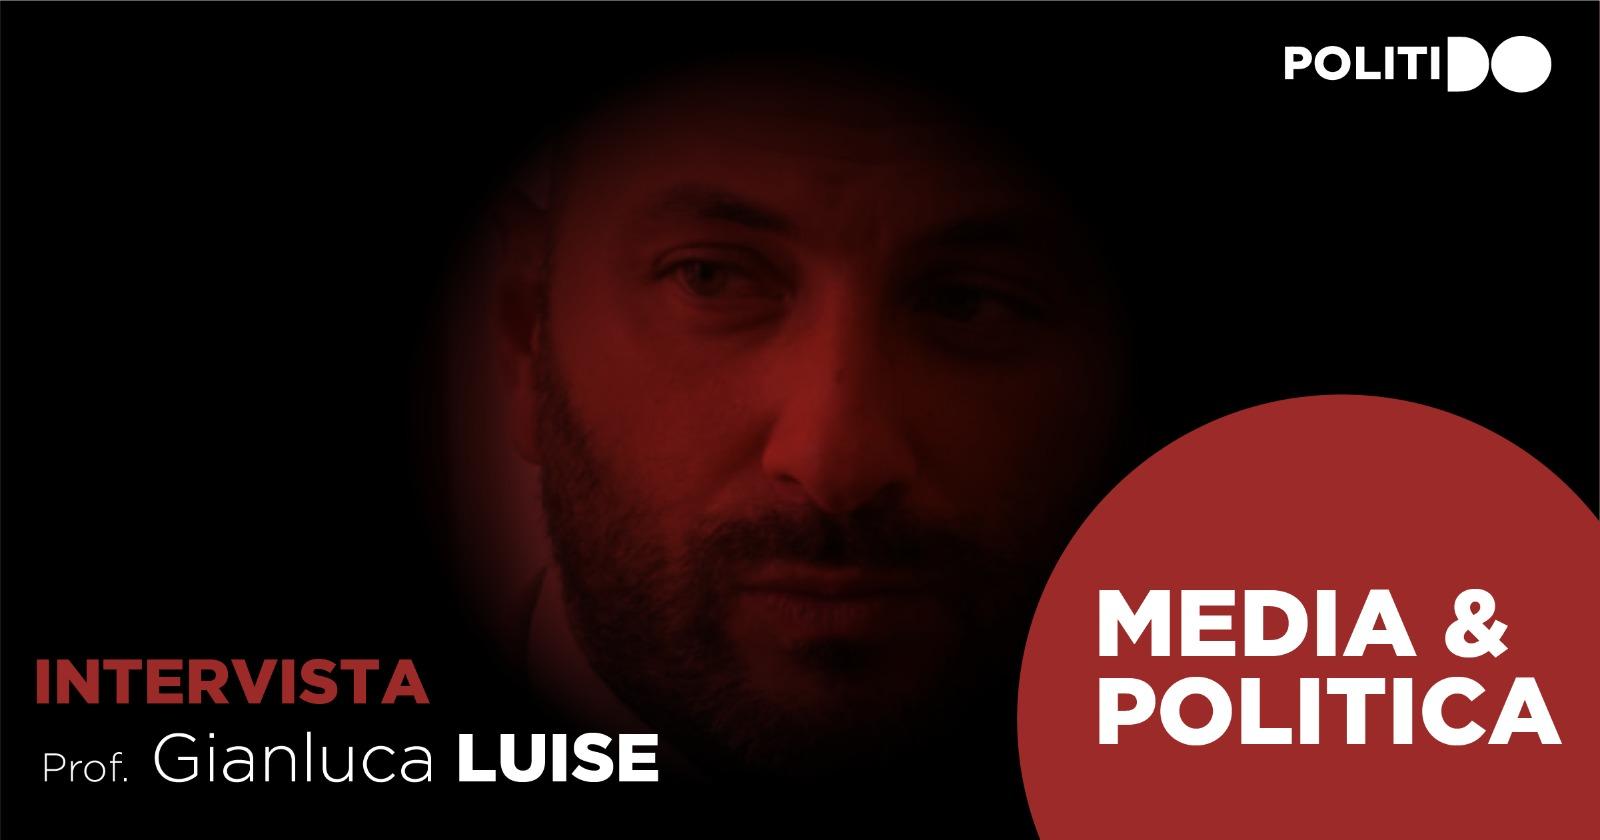 Comunicazione Politica, intervista a Gianluca Luise